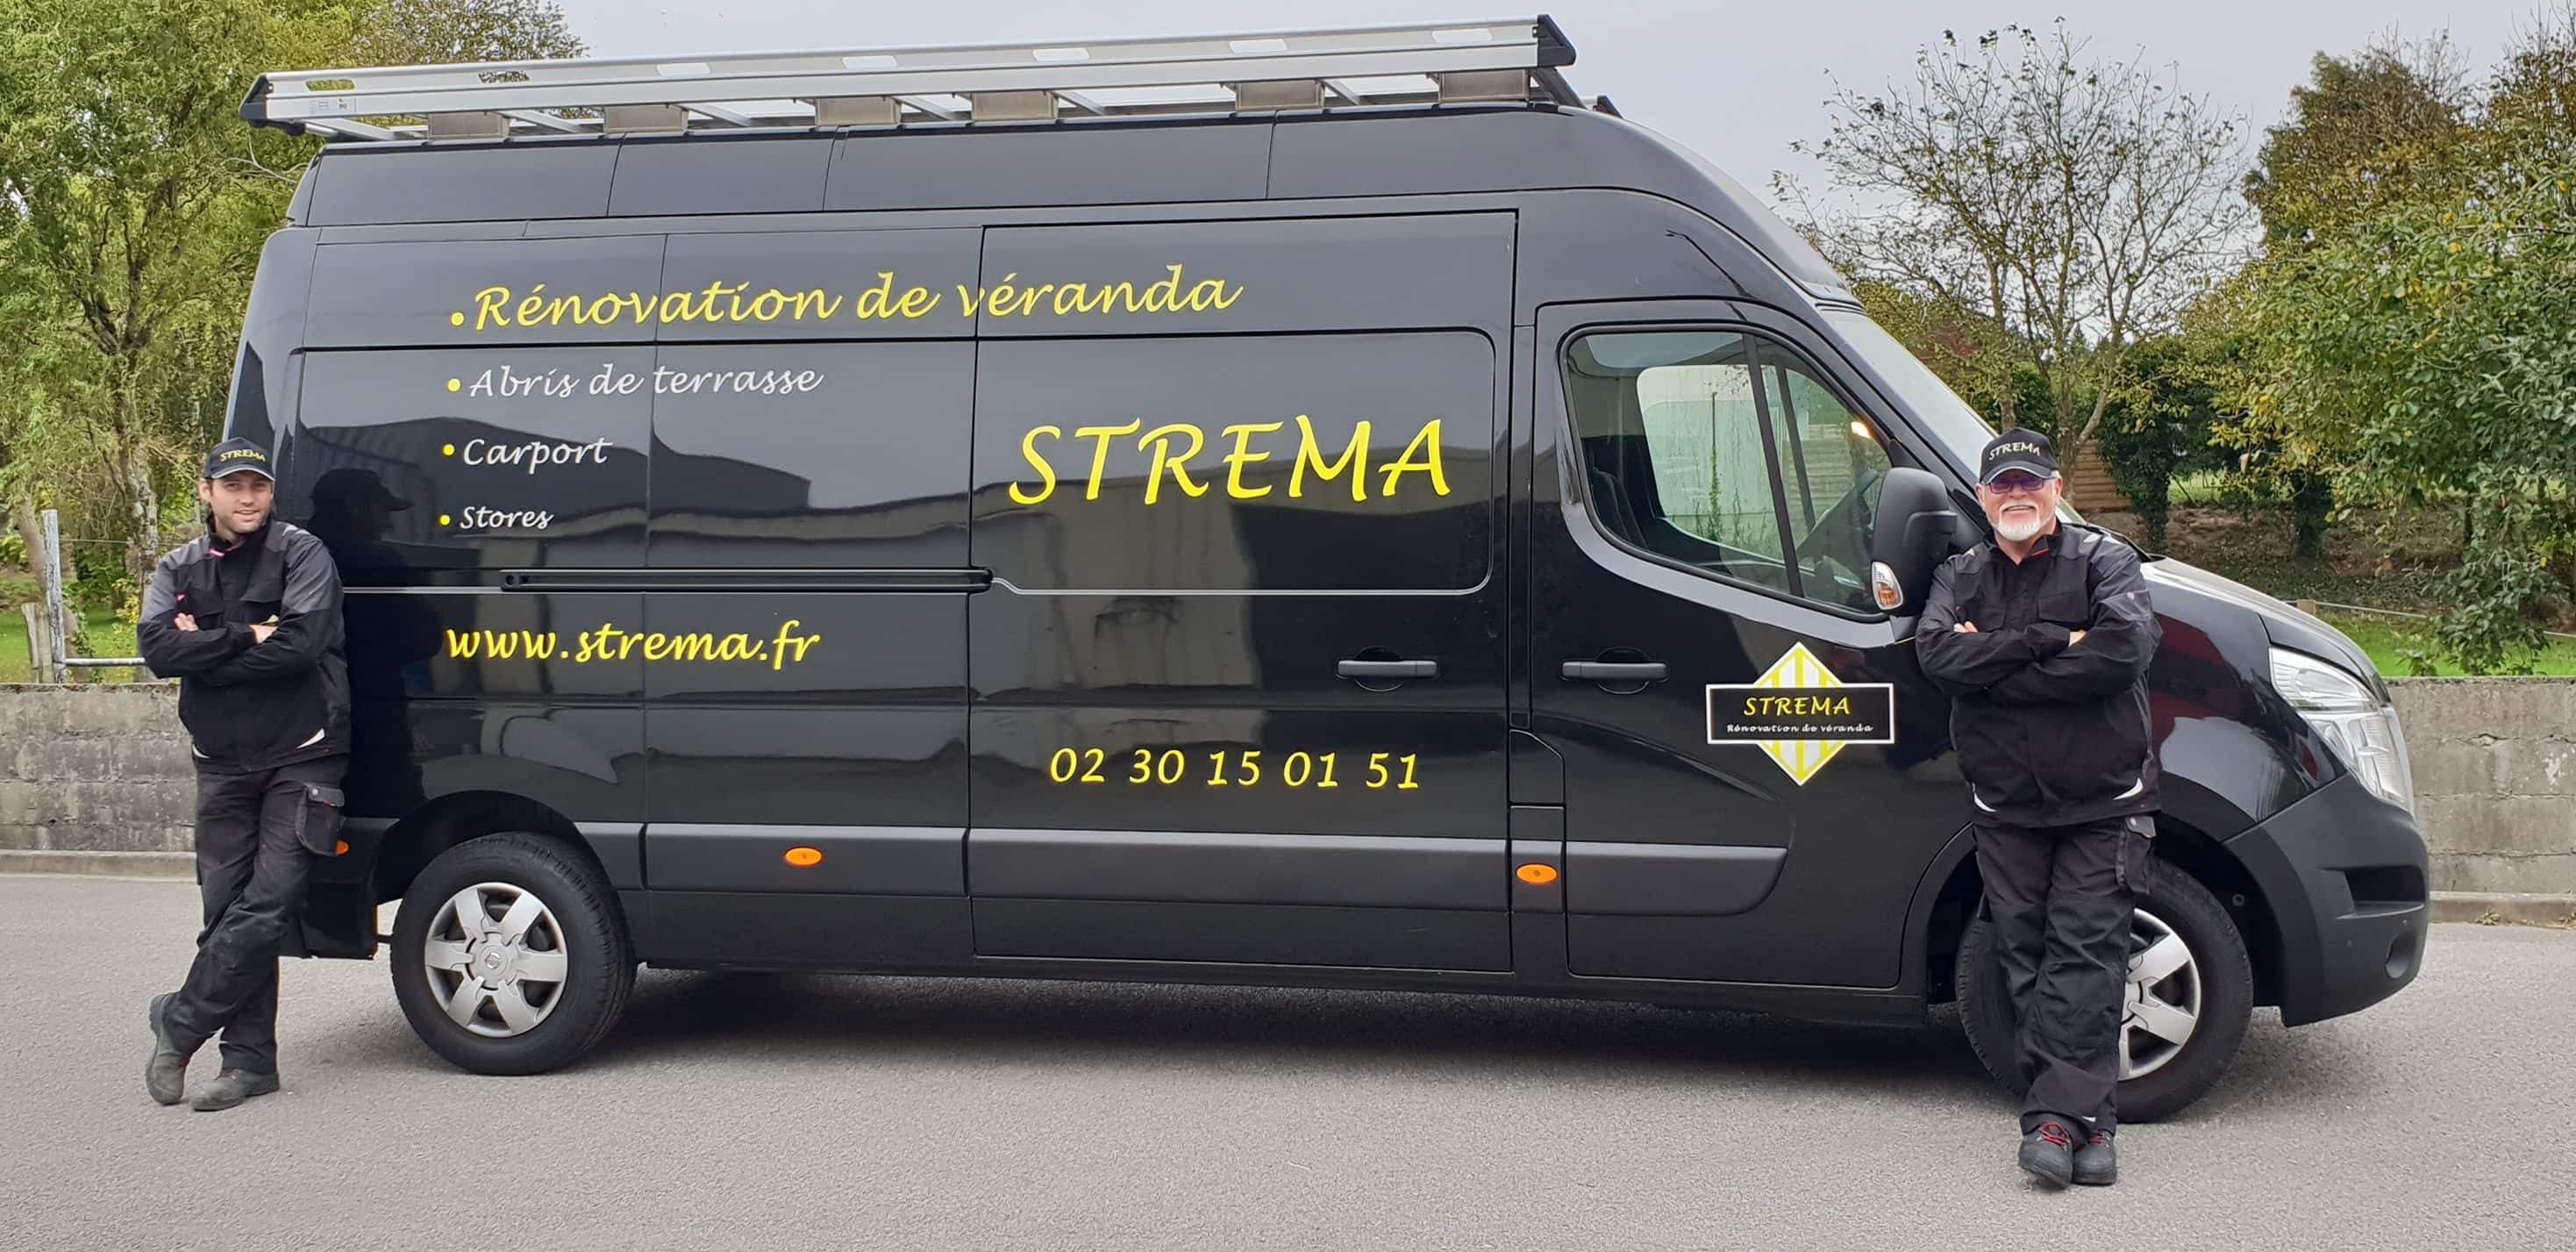 Camion strema